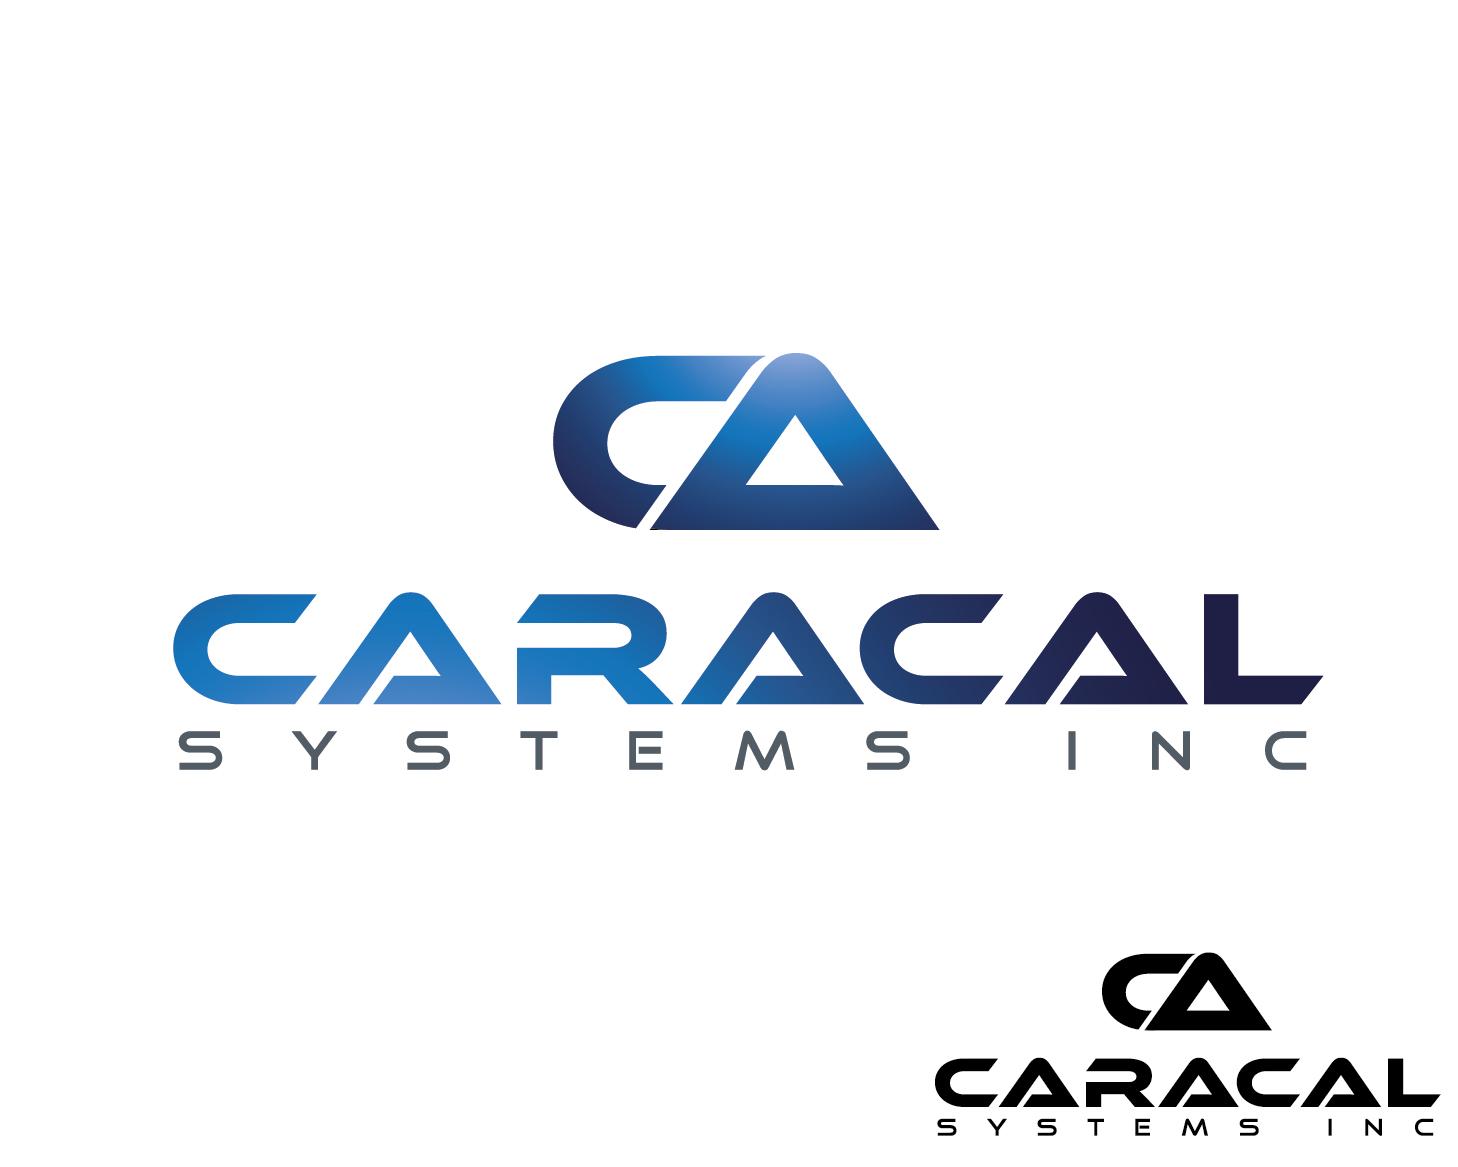 Logo Design by VENTSISLAV KOVACHEV - Entry No. 1 in the Logo Design Contest Inspiring Logo Design for Caracal Systems Inc..